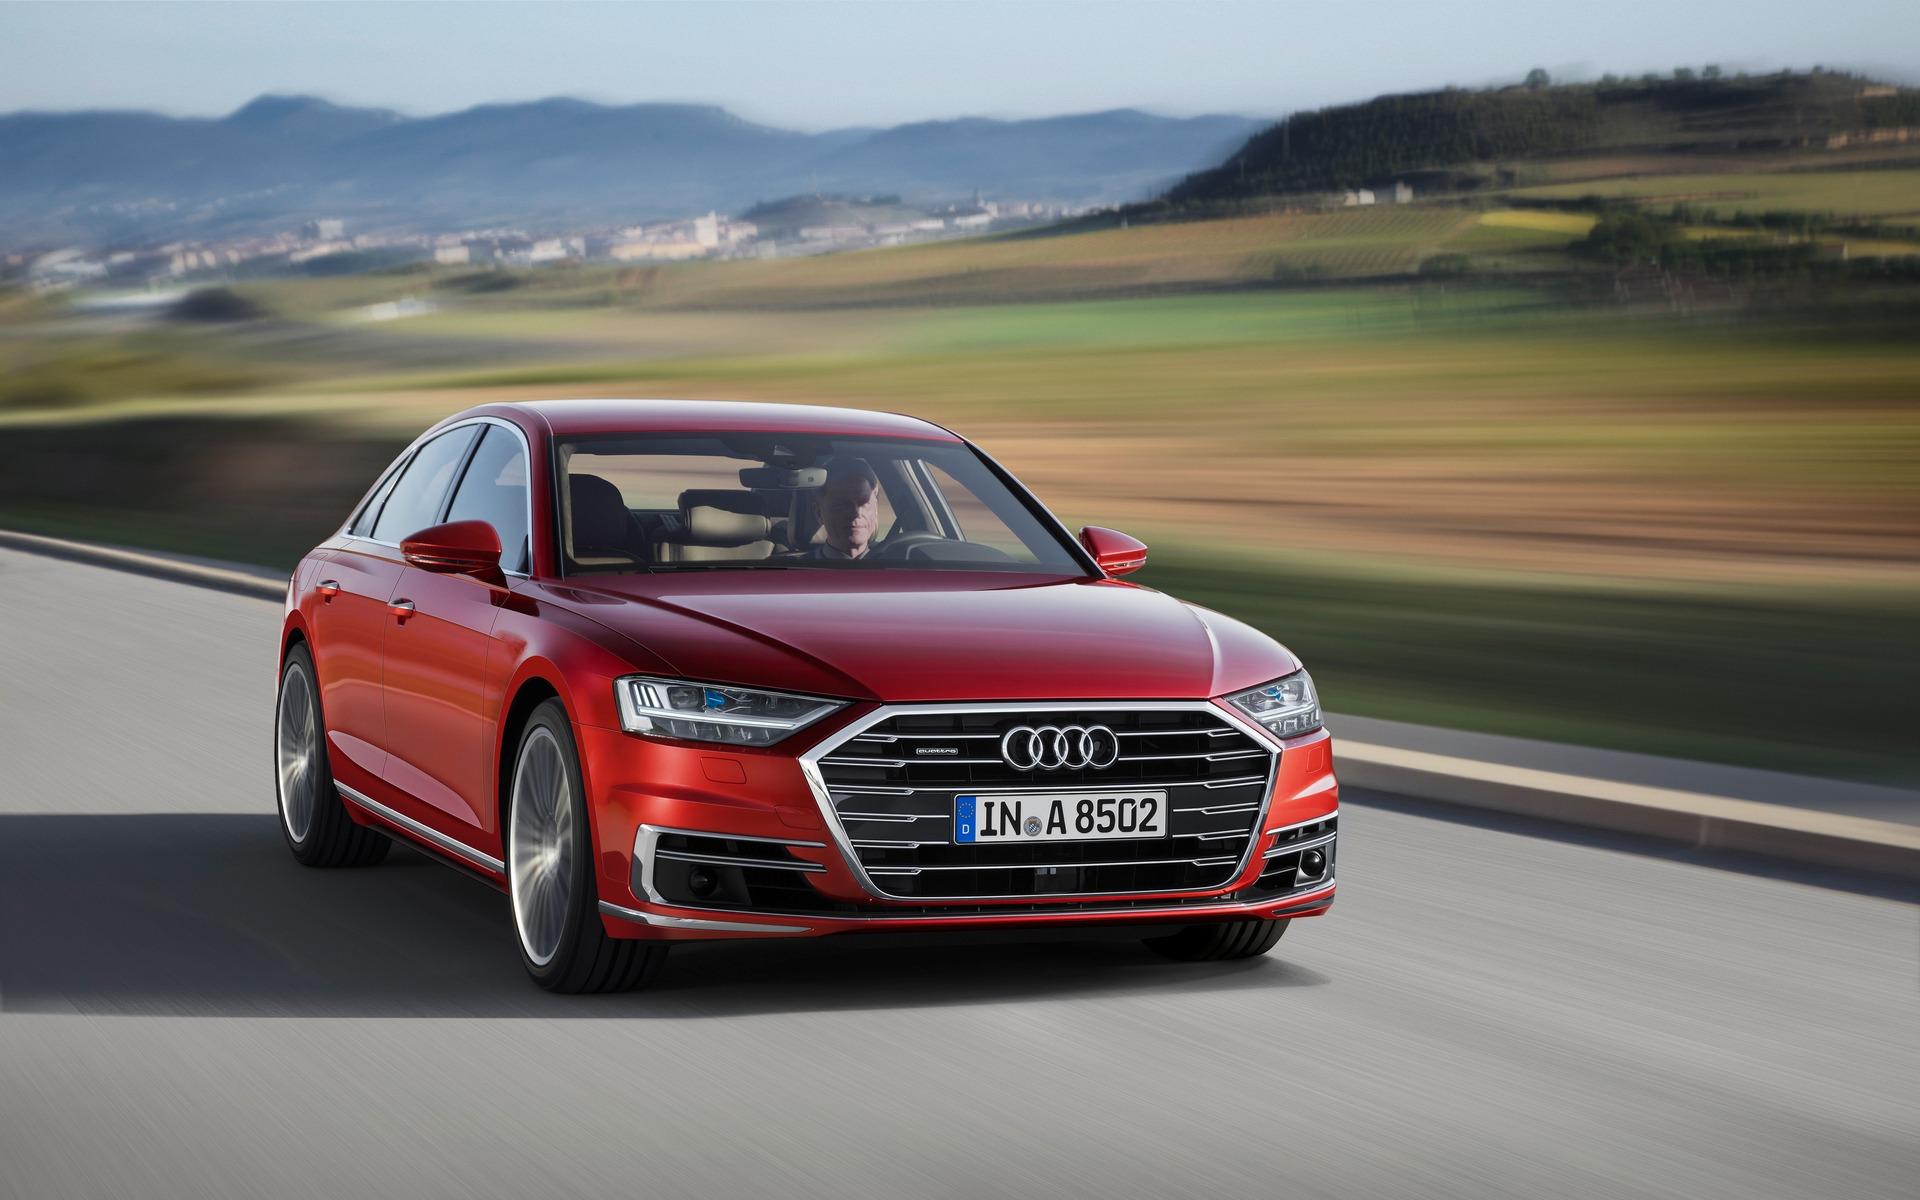 Reprogrammation Audi A8 50 TDI (3.0D) 286